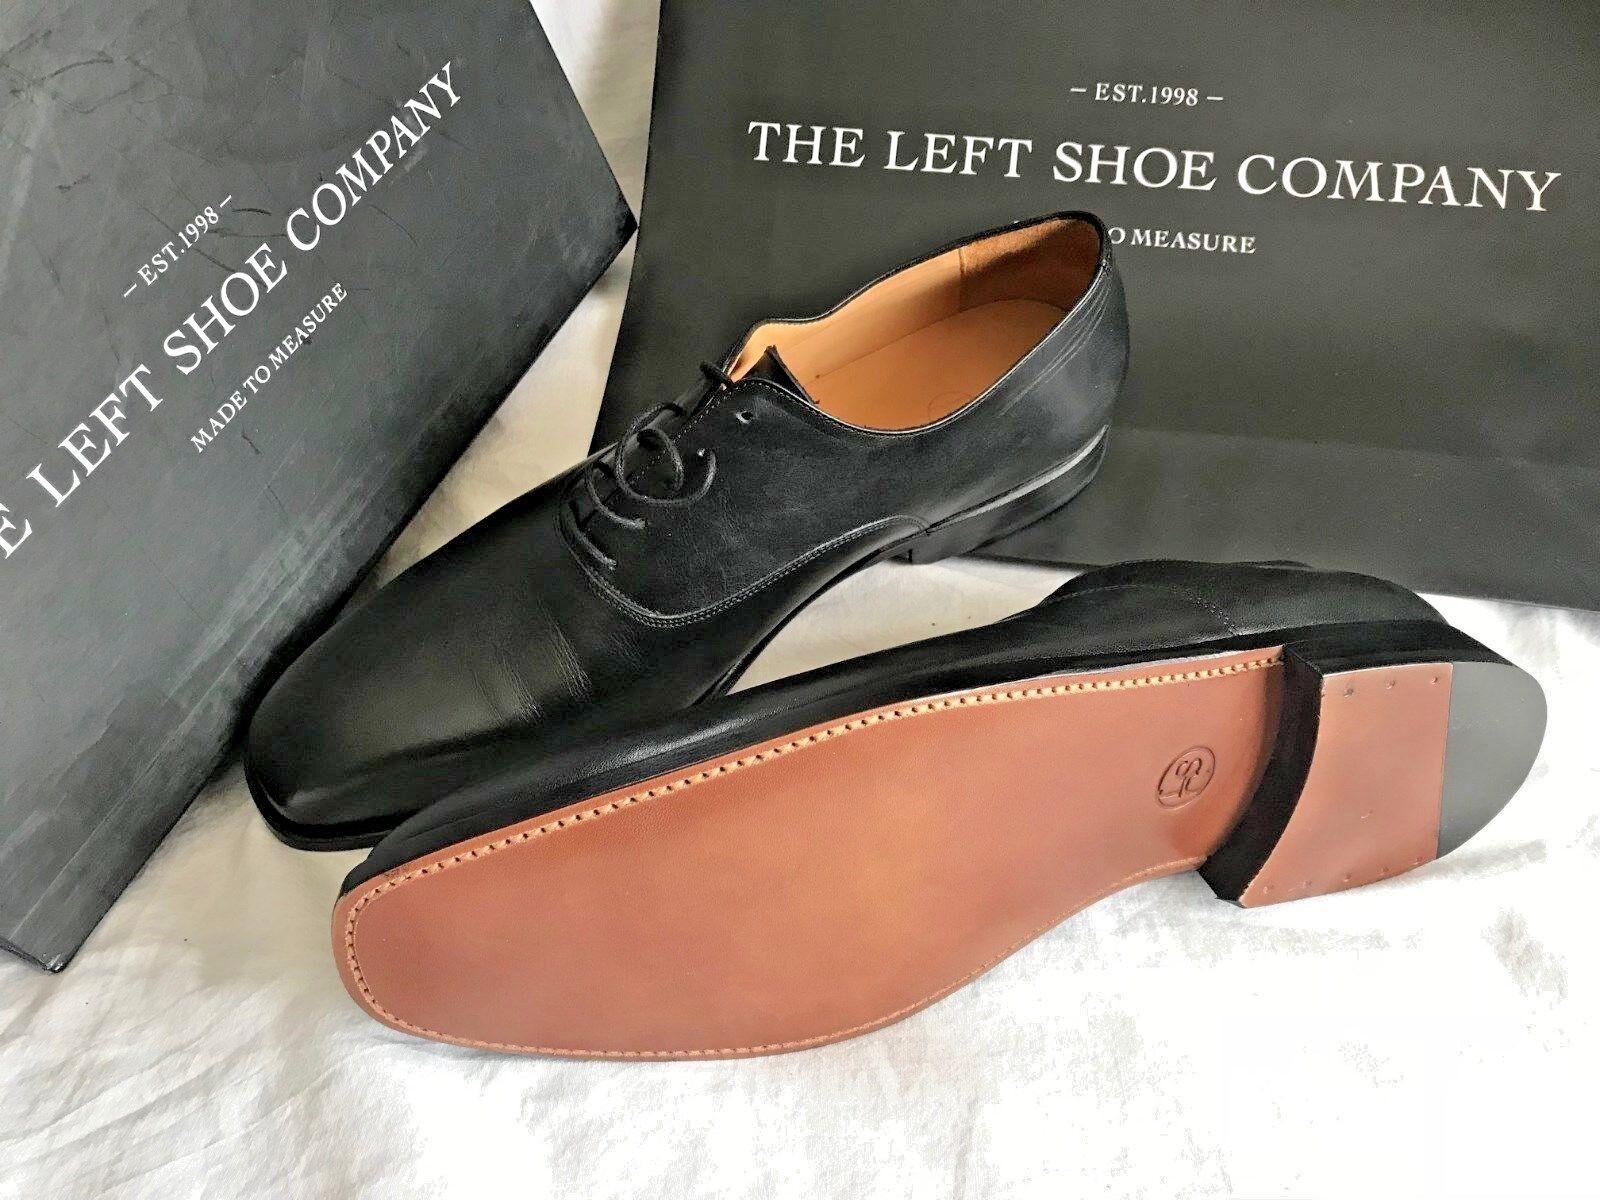 finest selection b1ebe bd981 ... La chaussure Gauche Société custom made made made entier Coupé Derby  Comfy Chaussures Tailles f7c1c3